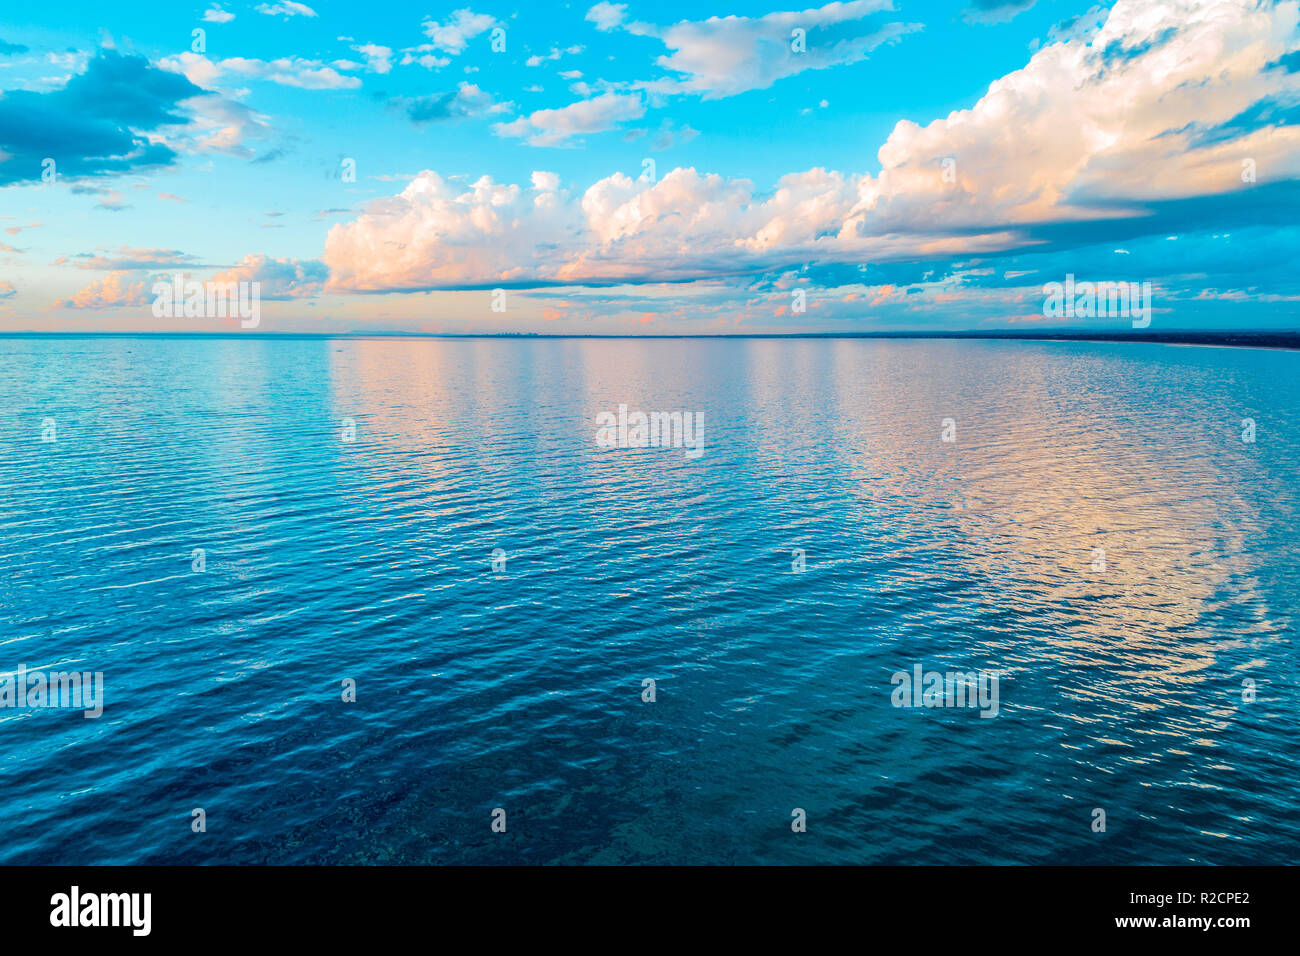 Beautiful minimalism - clouds over calm sea water at sunrise - Stock Image